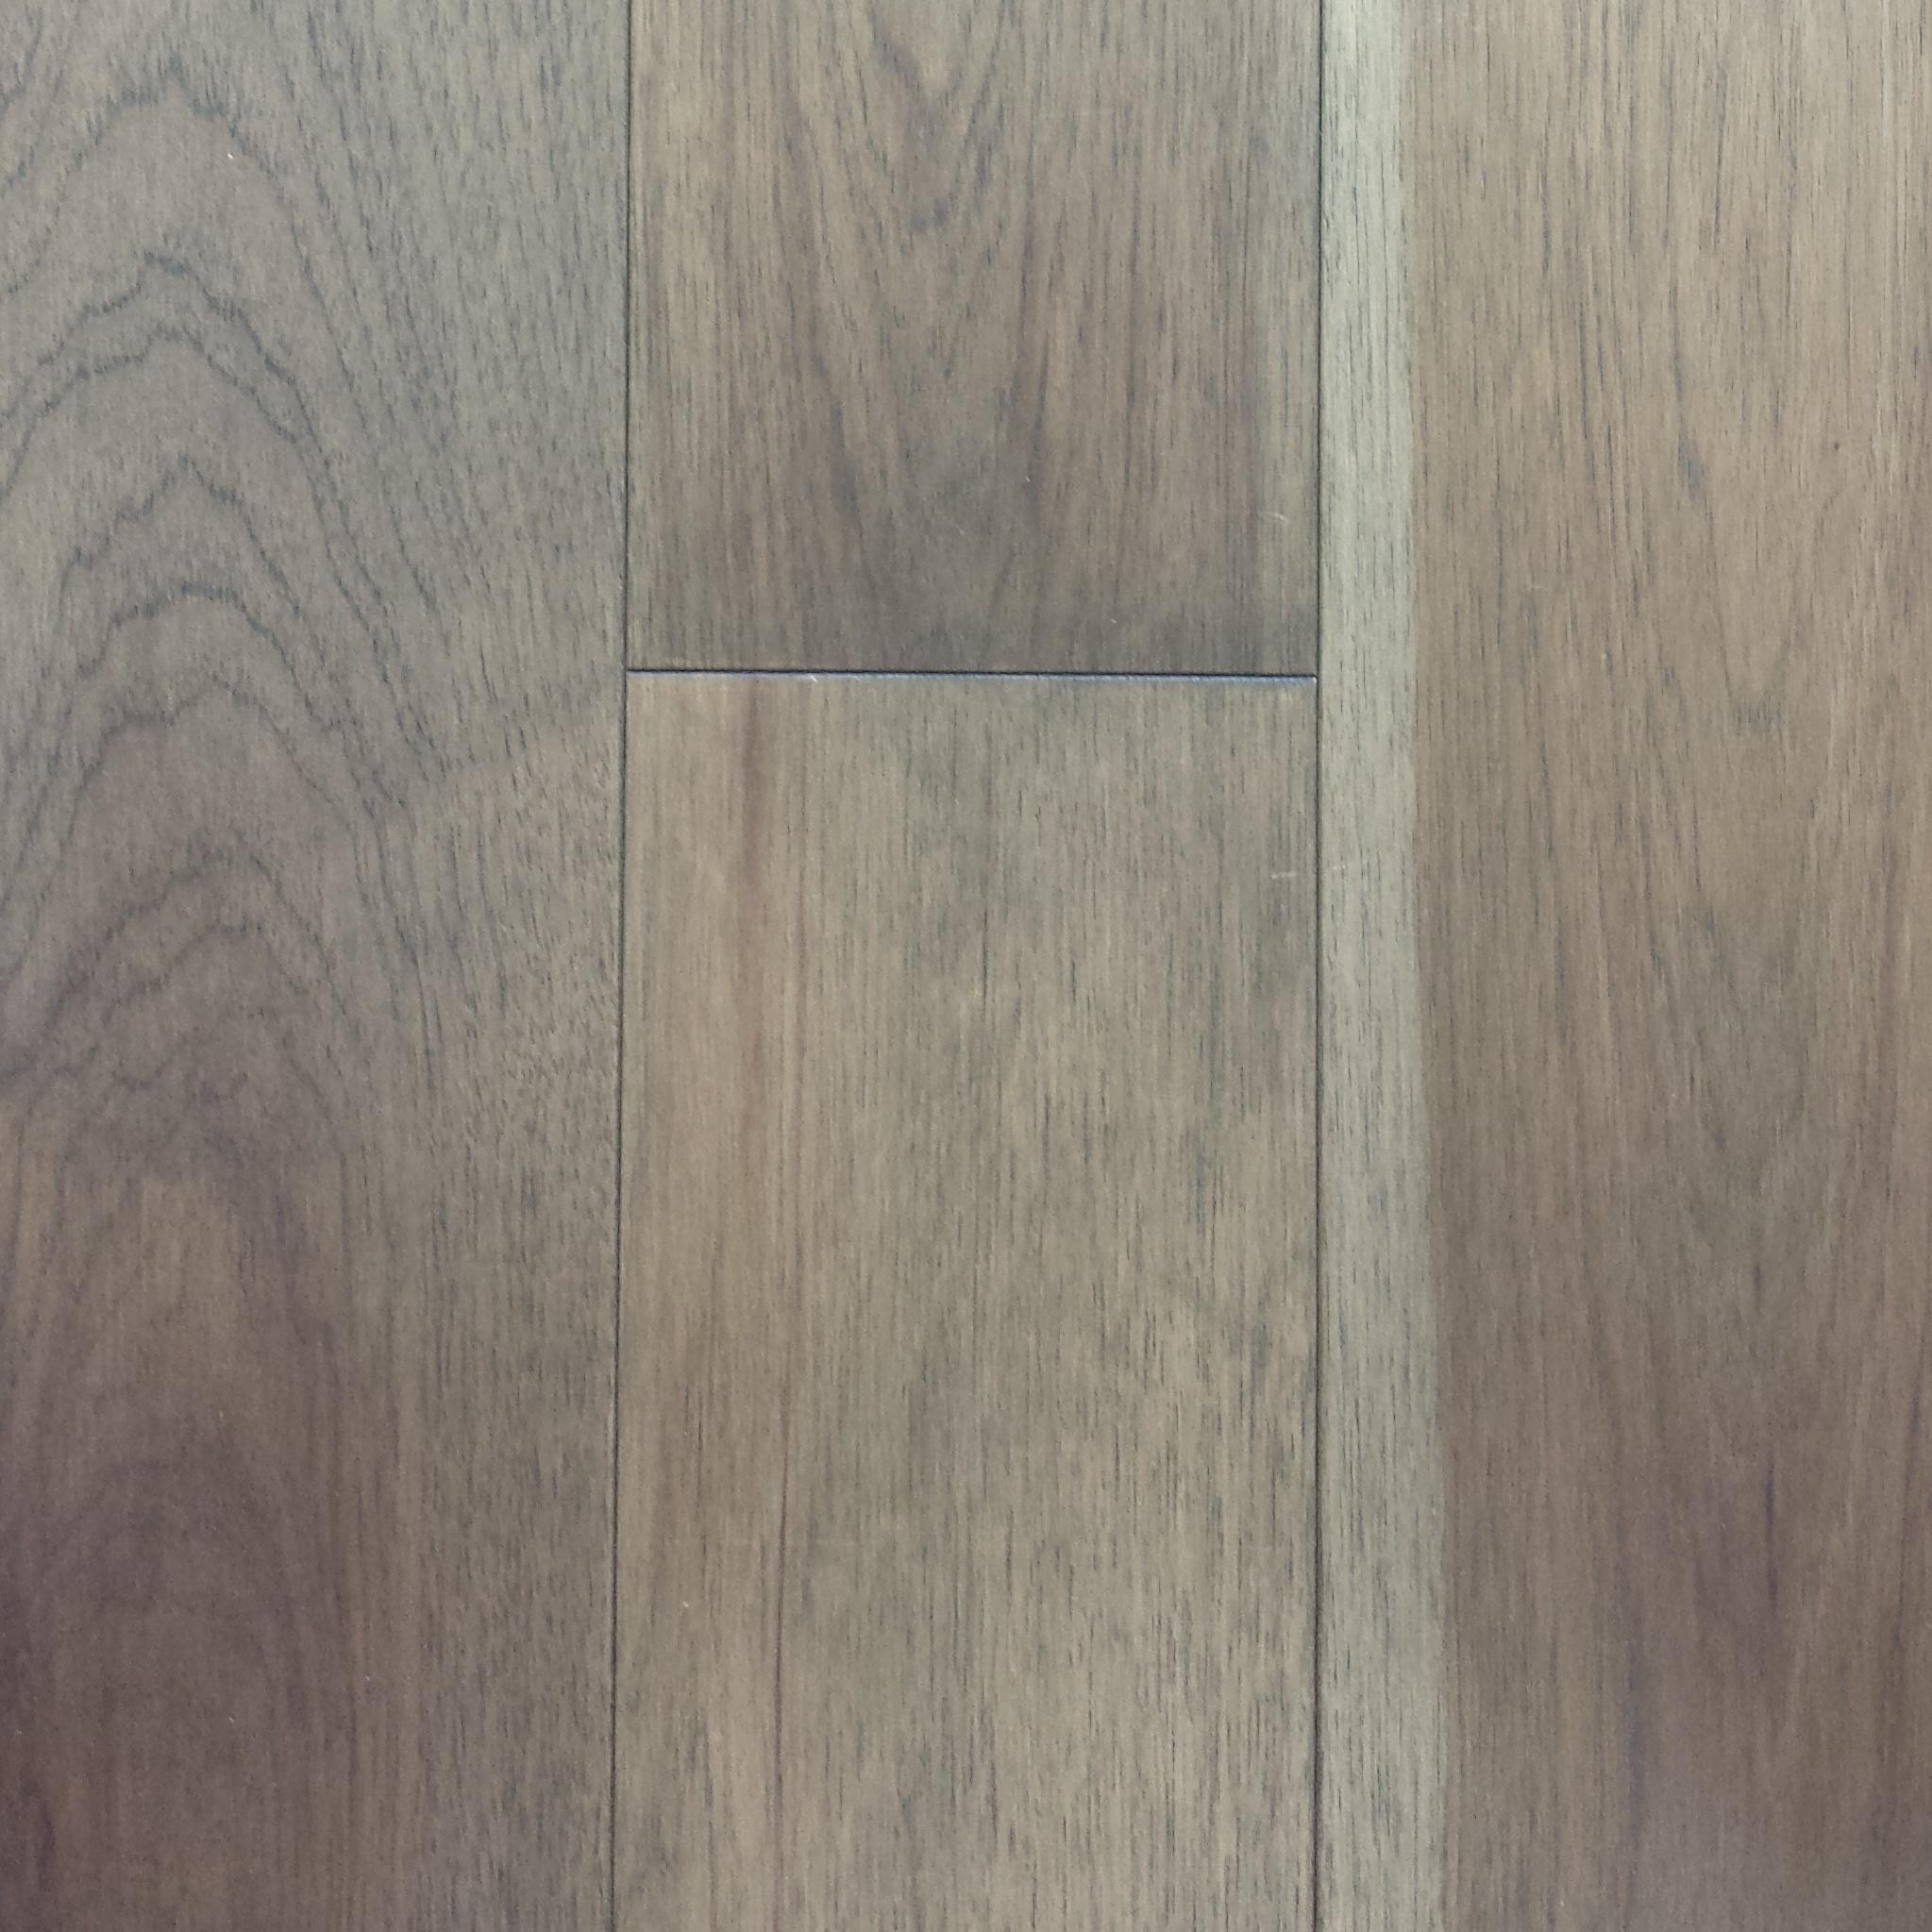 American Flooring Ingénierie hickory sélect naturel pré-verni mat